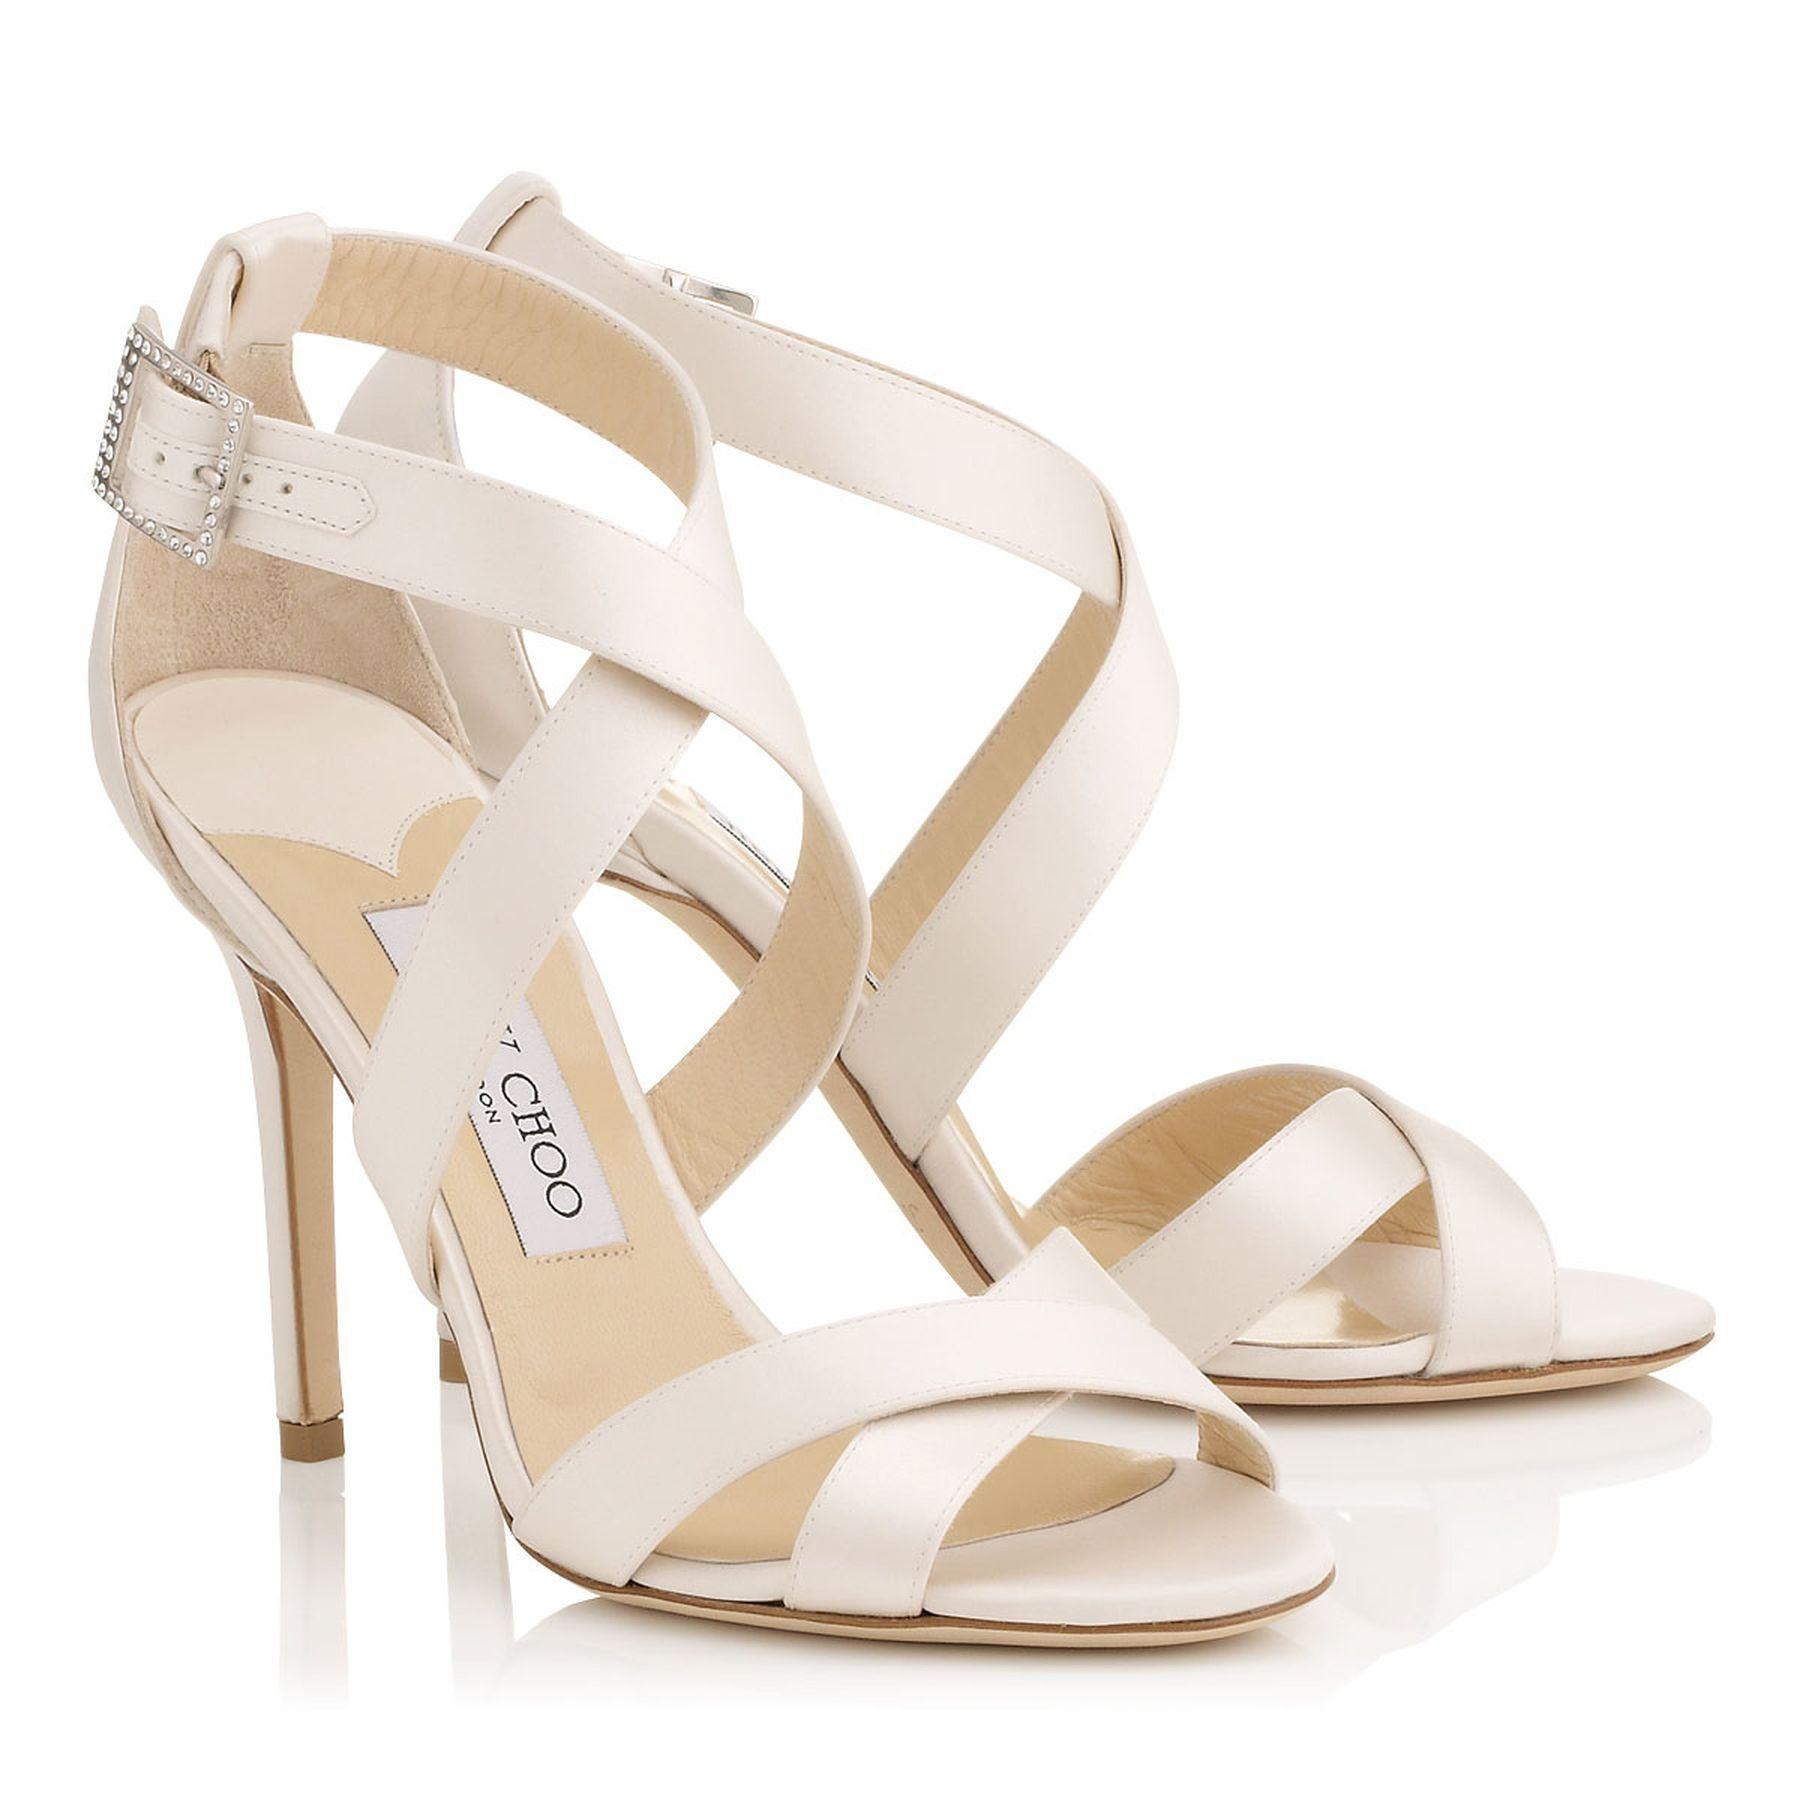 Strappy Ivory Heels